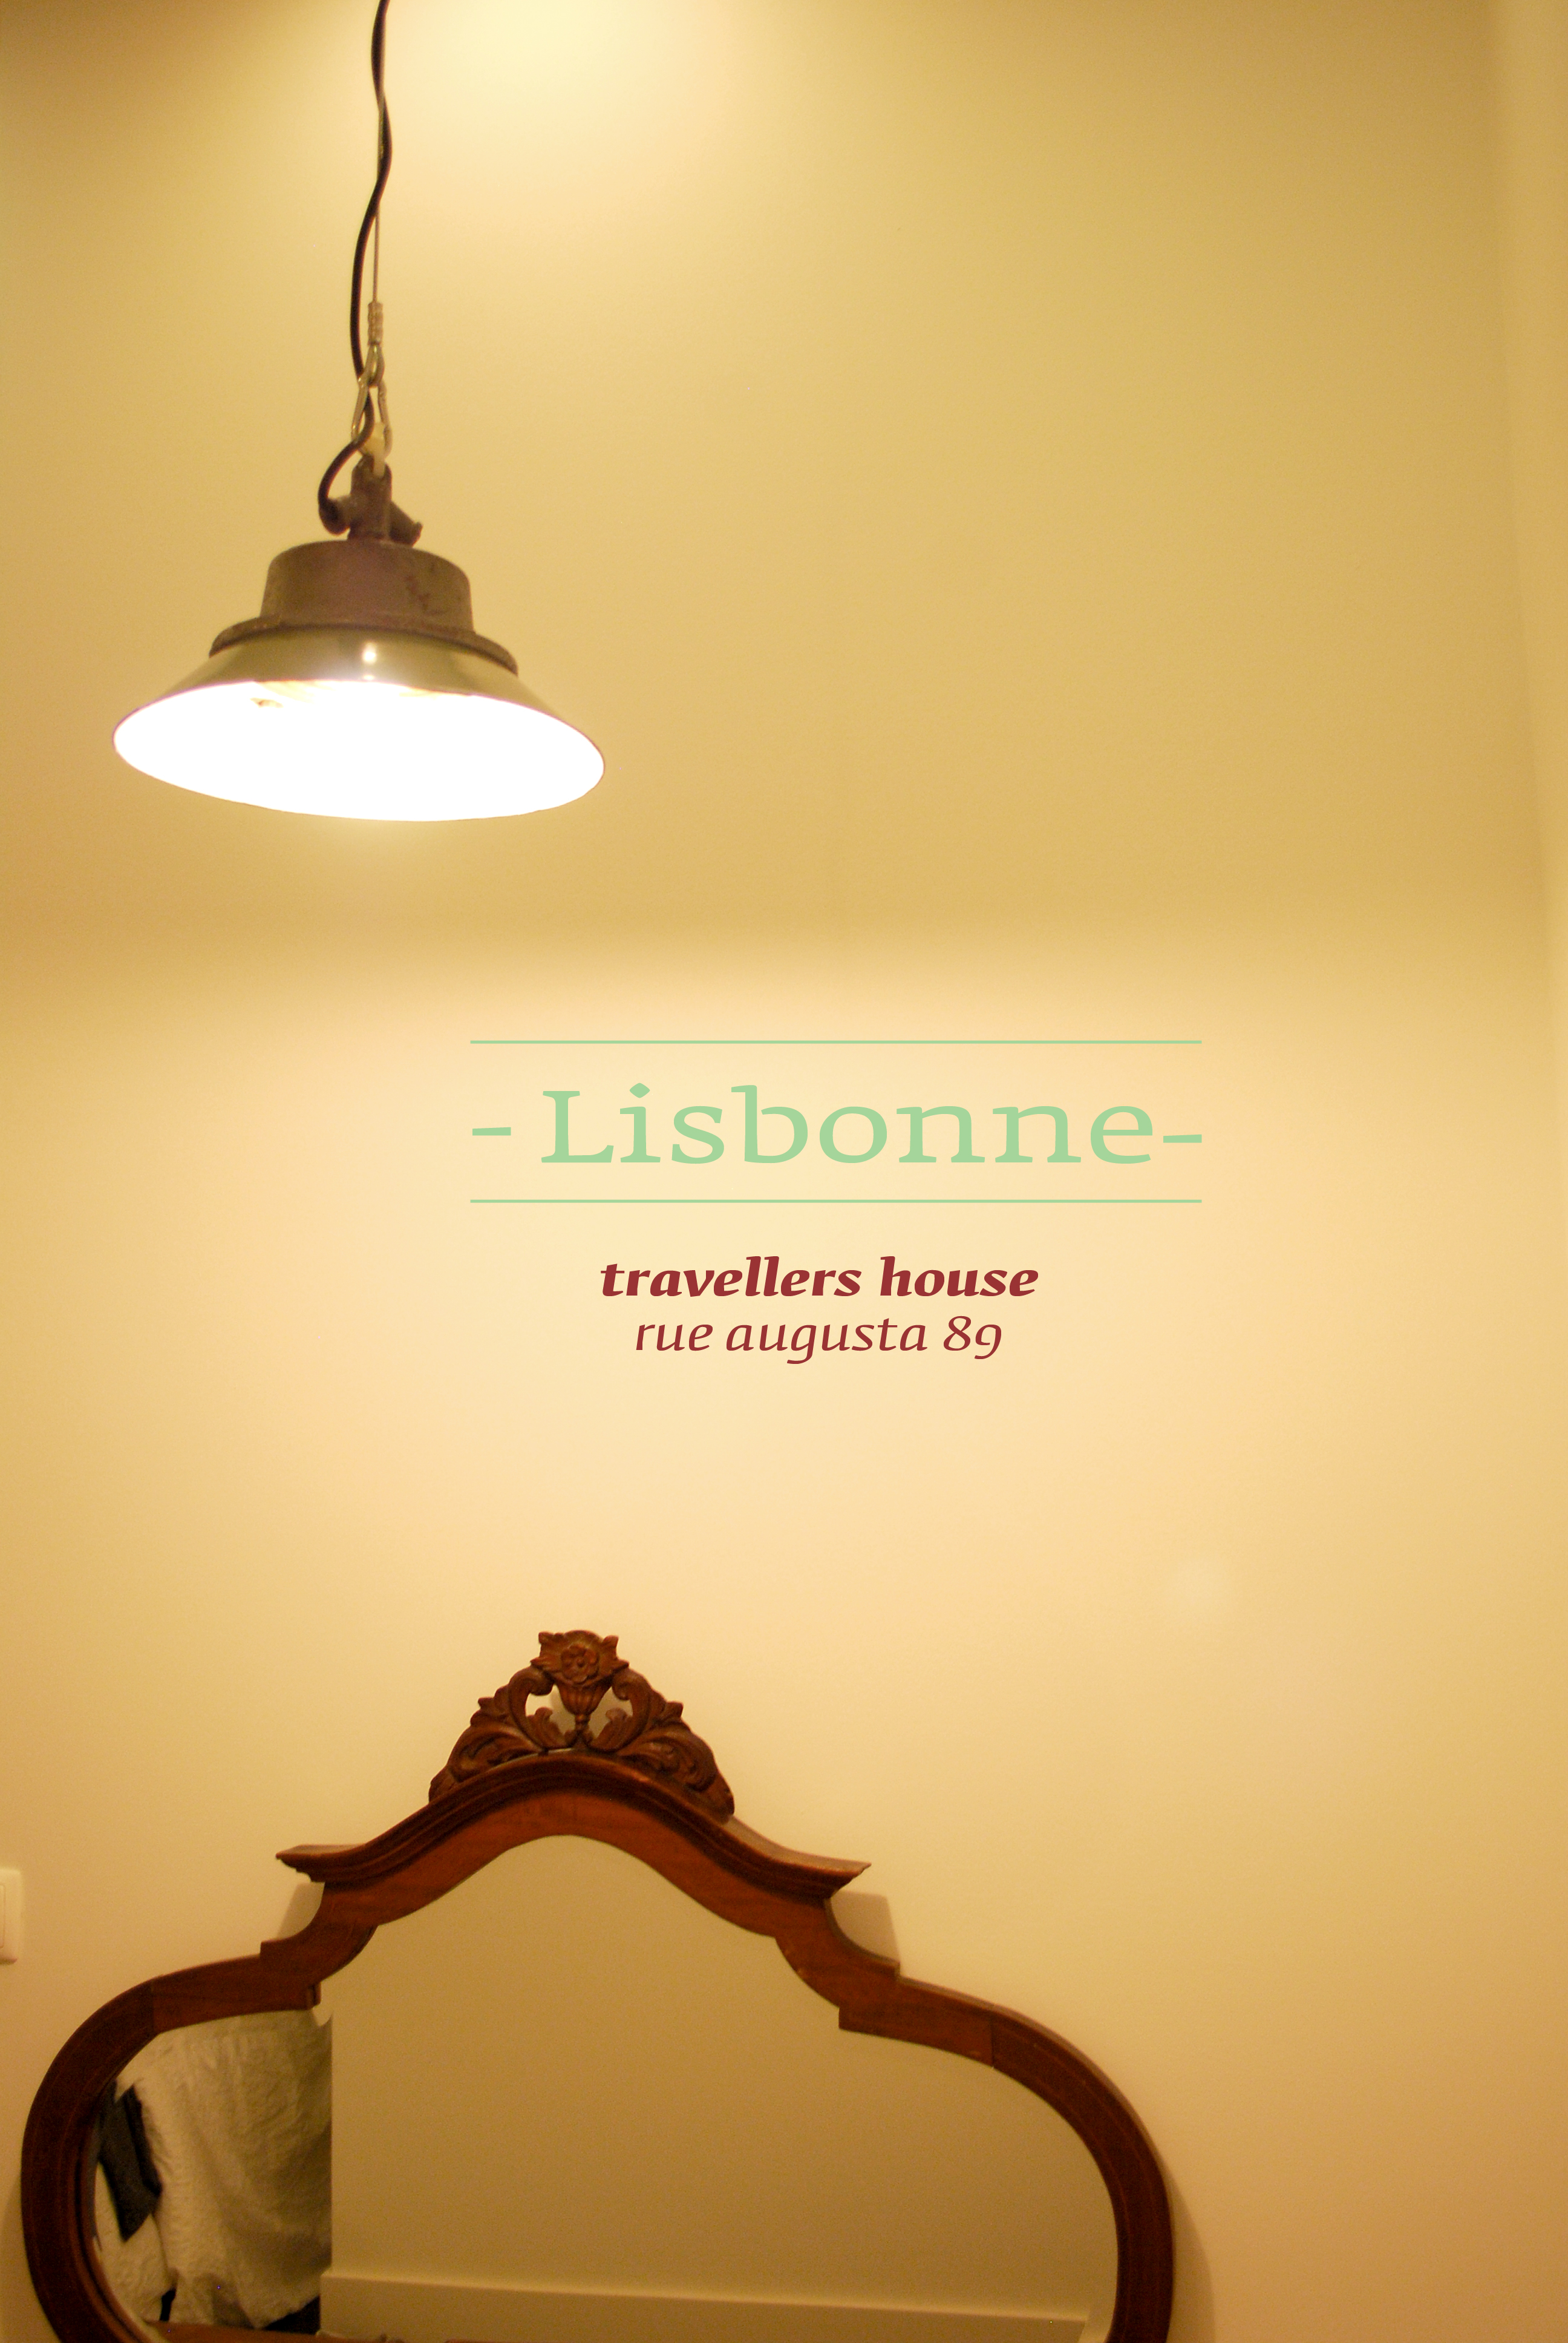 lisbonne-travellershouse-by-le-polyedre_1